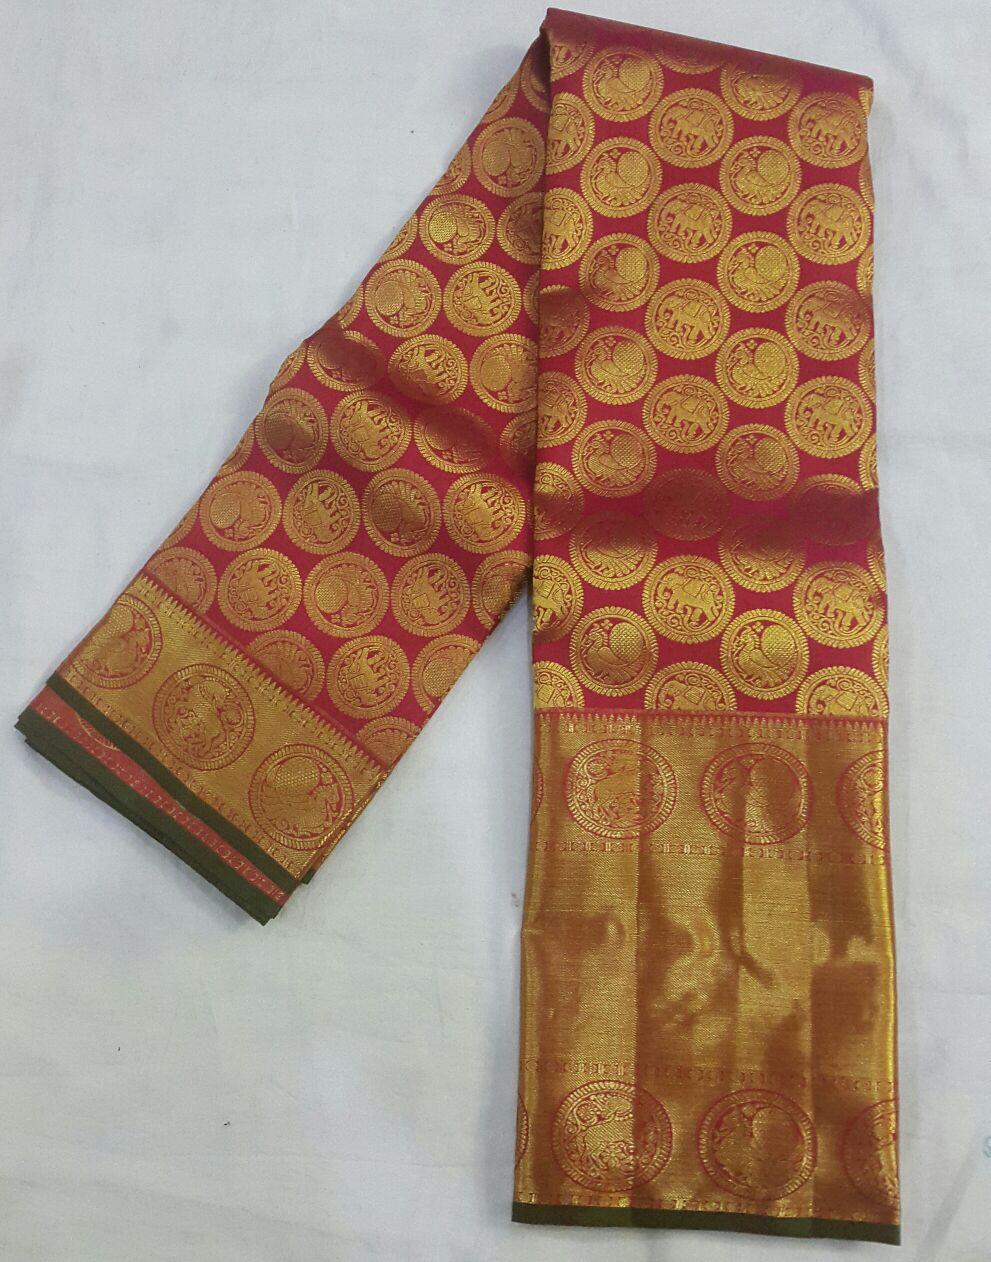 5425b5057a1be Kanjeevaram Silk Sarees for wedding in Kanchi Mahalakshmi Silk Shop  www.kanchipuramsilkwholesale.com Cell   9941653218  wedding  sillk  saree   wholesale ...